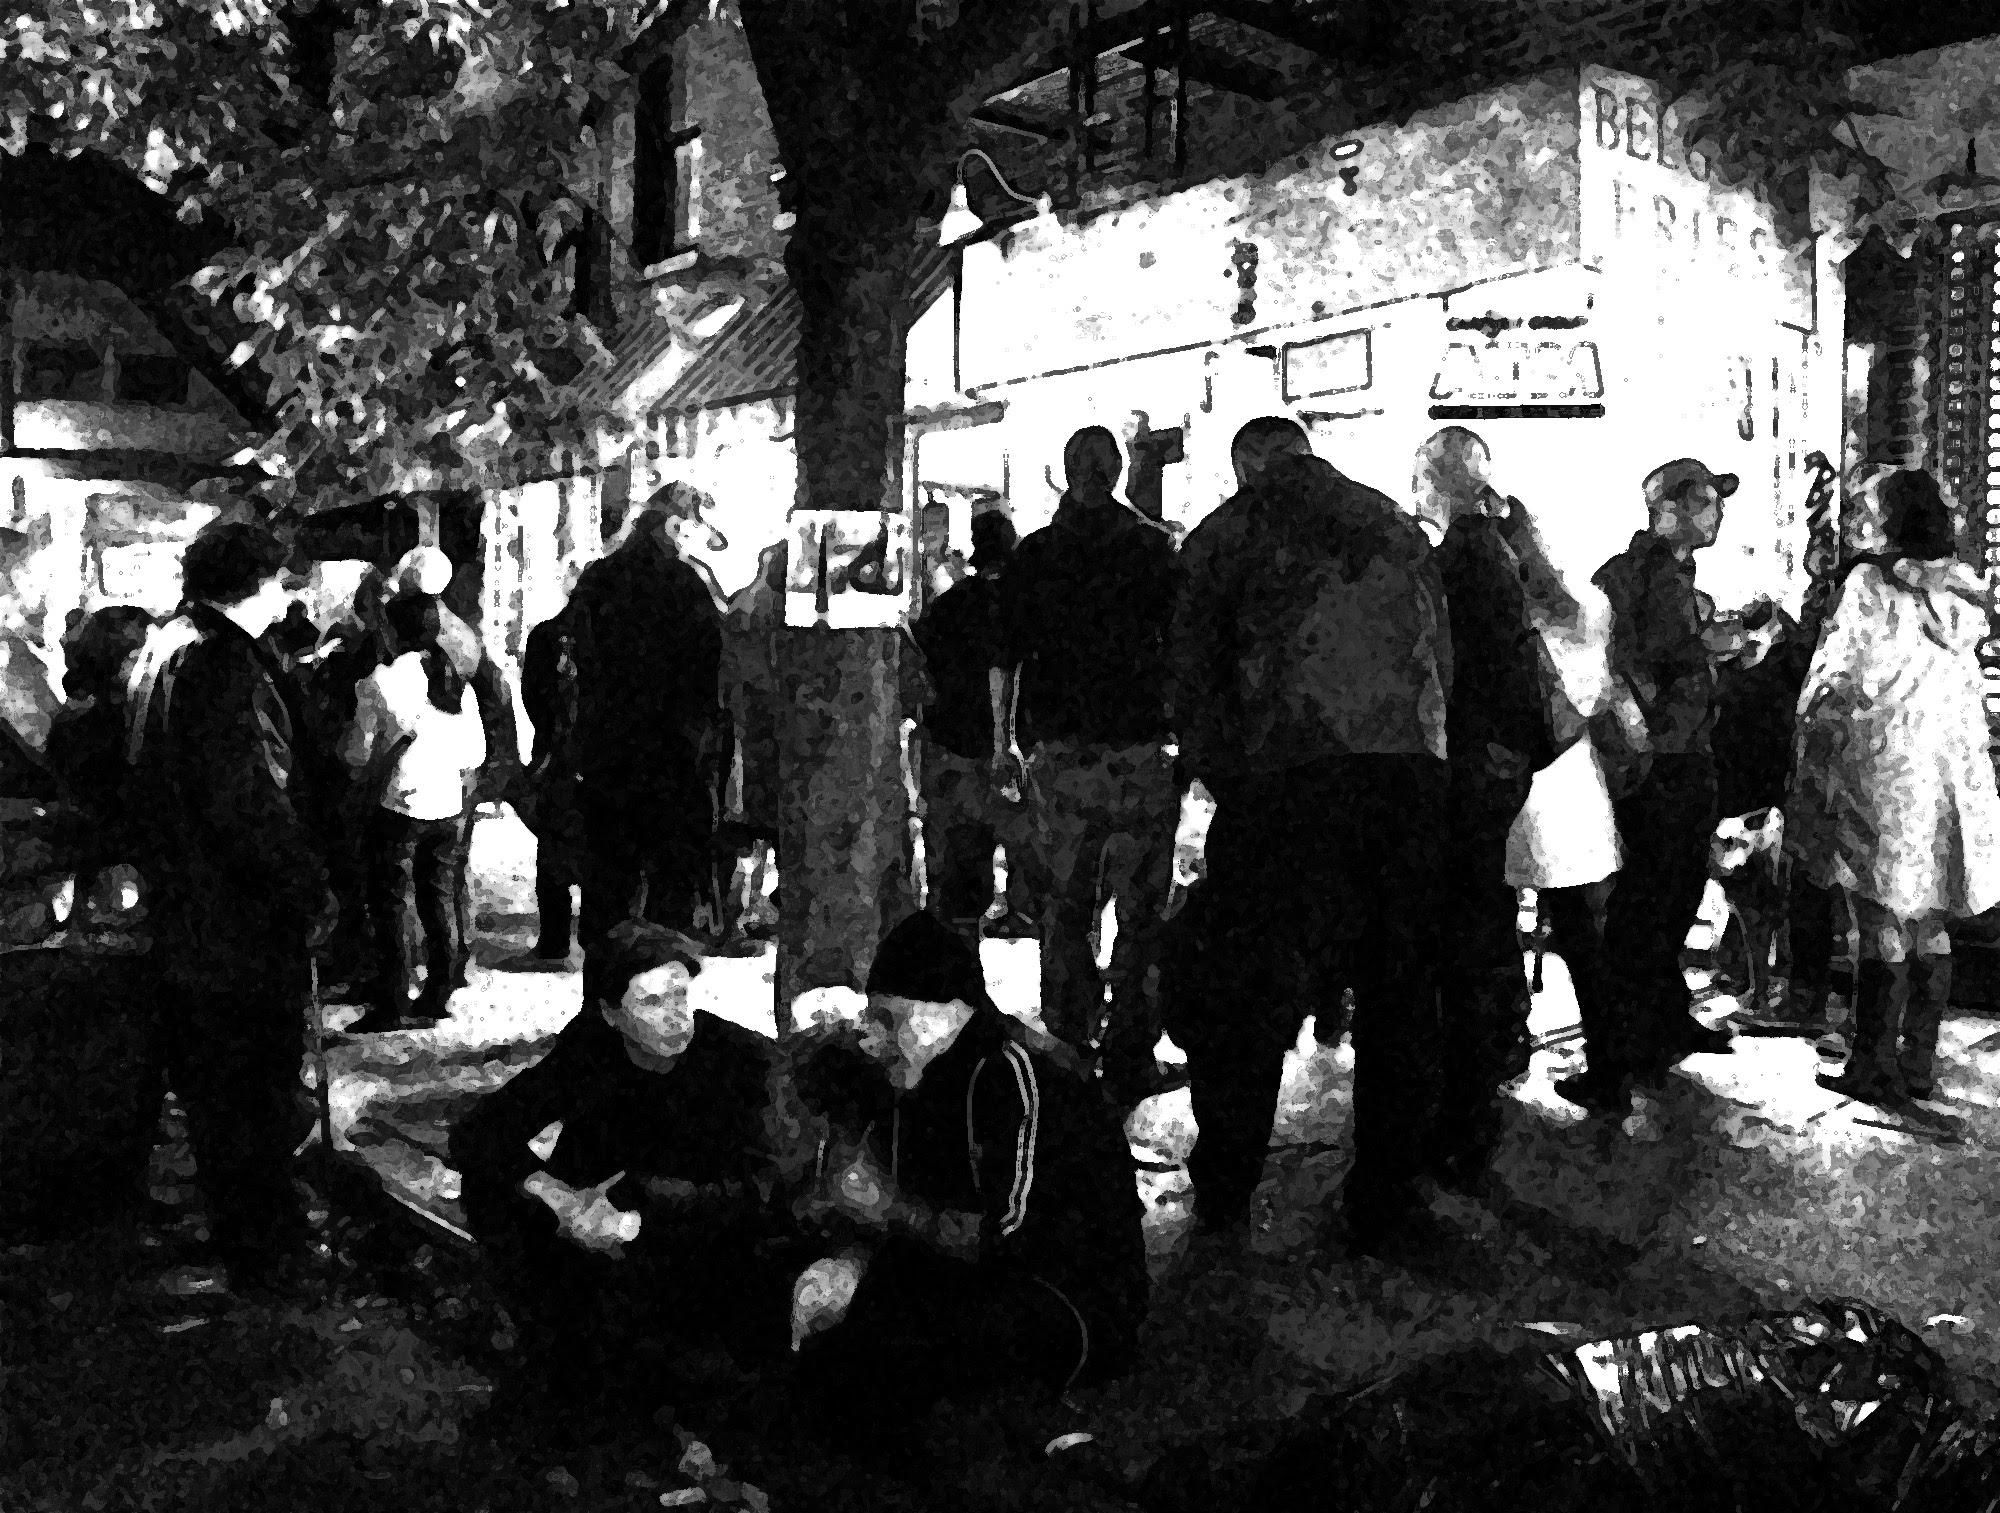 Vigil for Bob Arihood